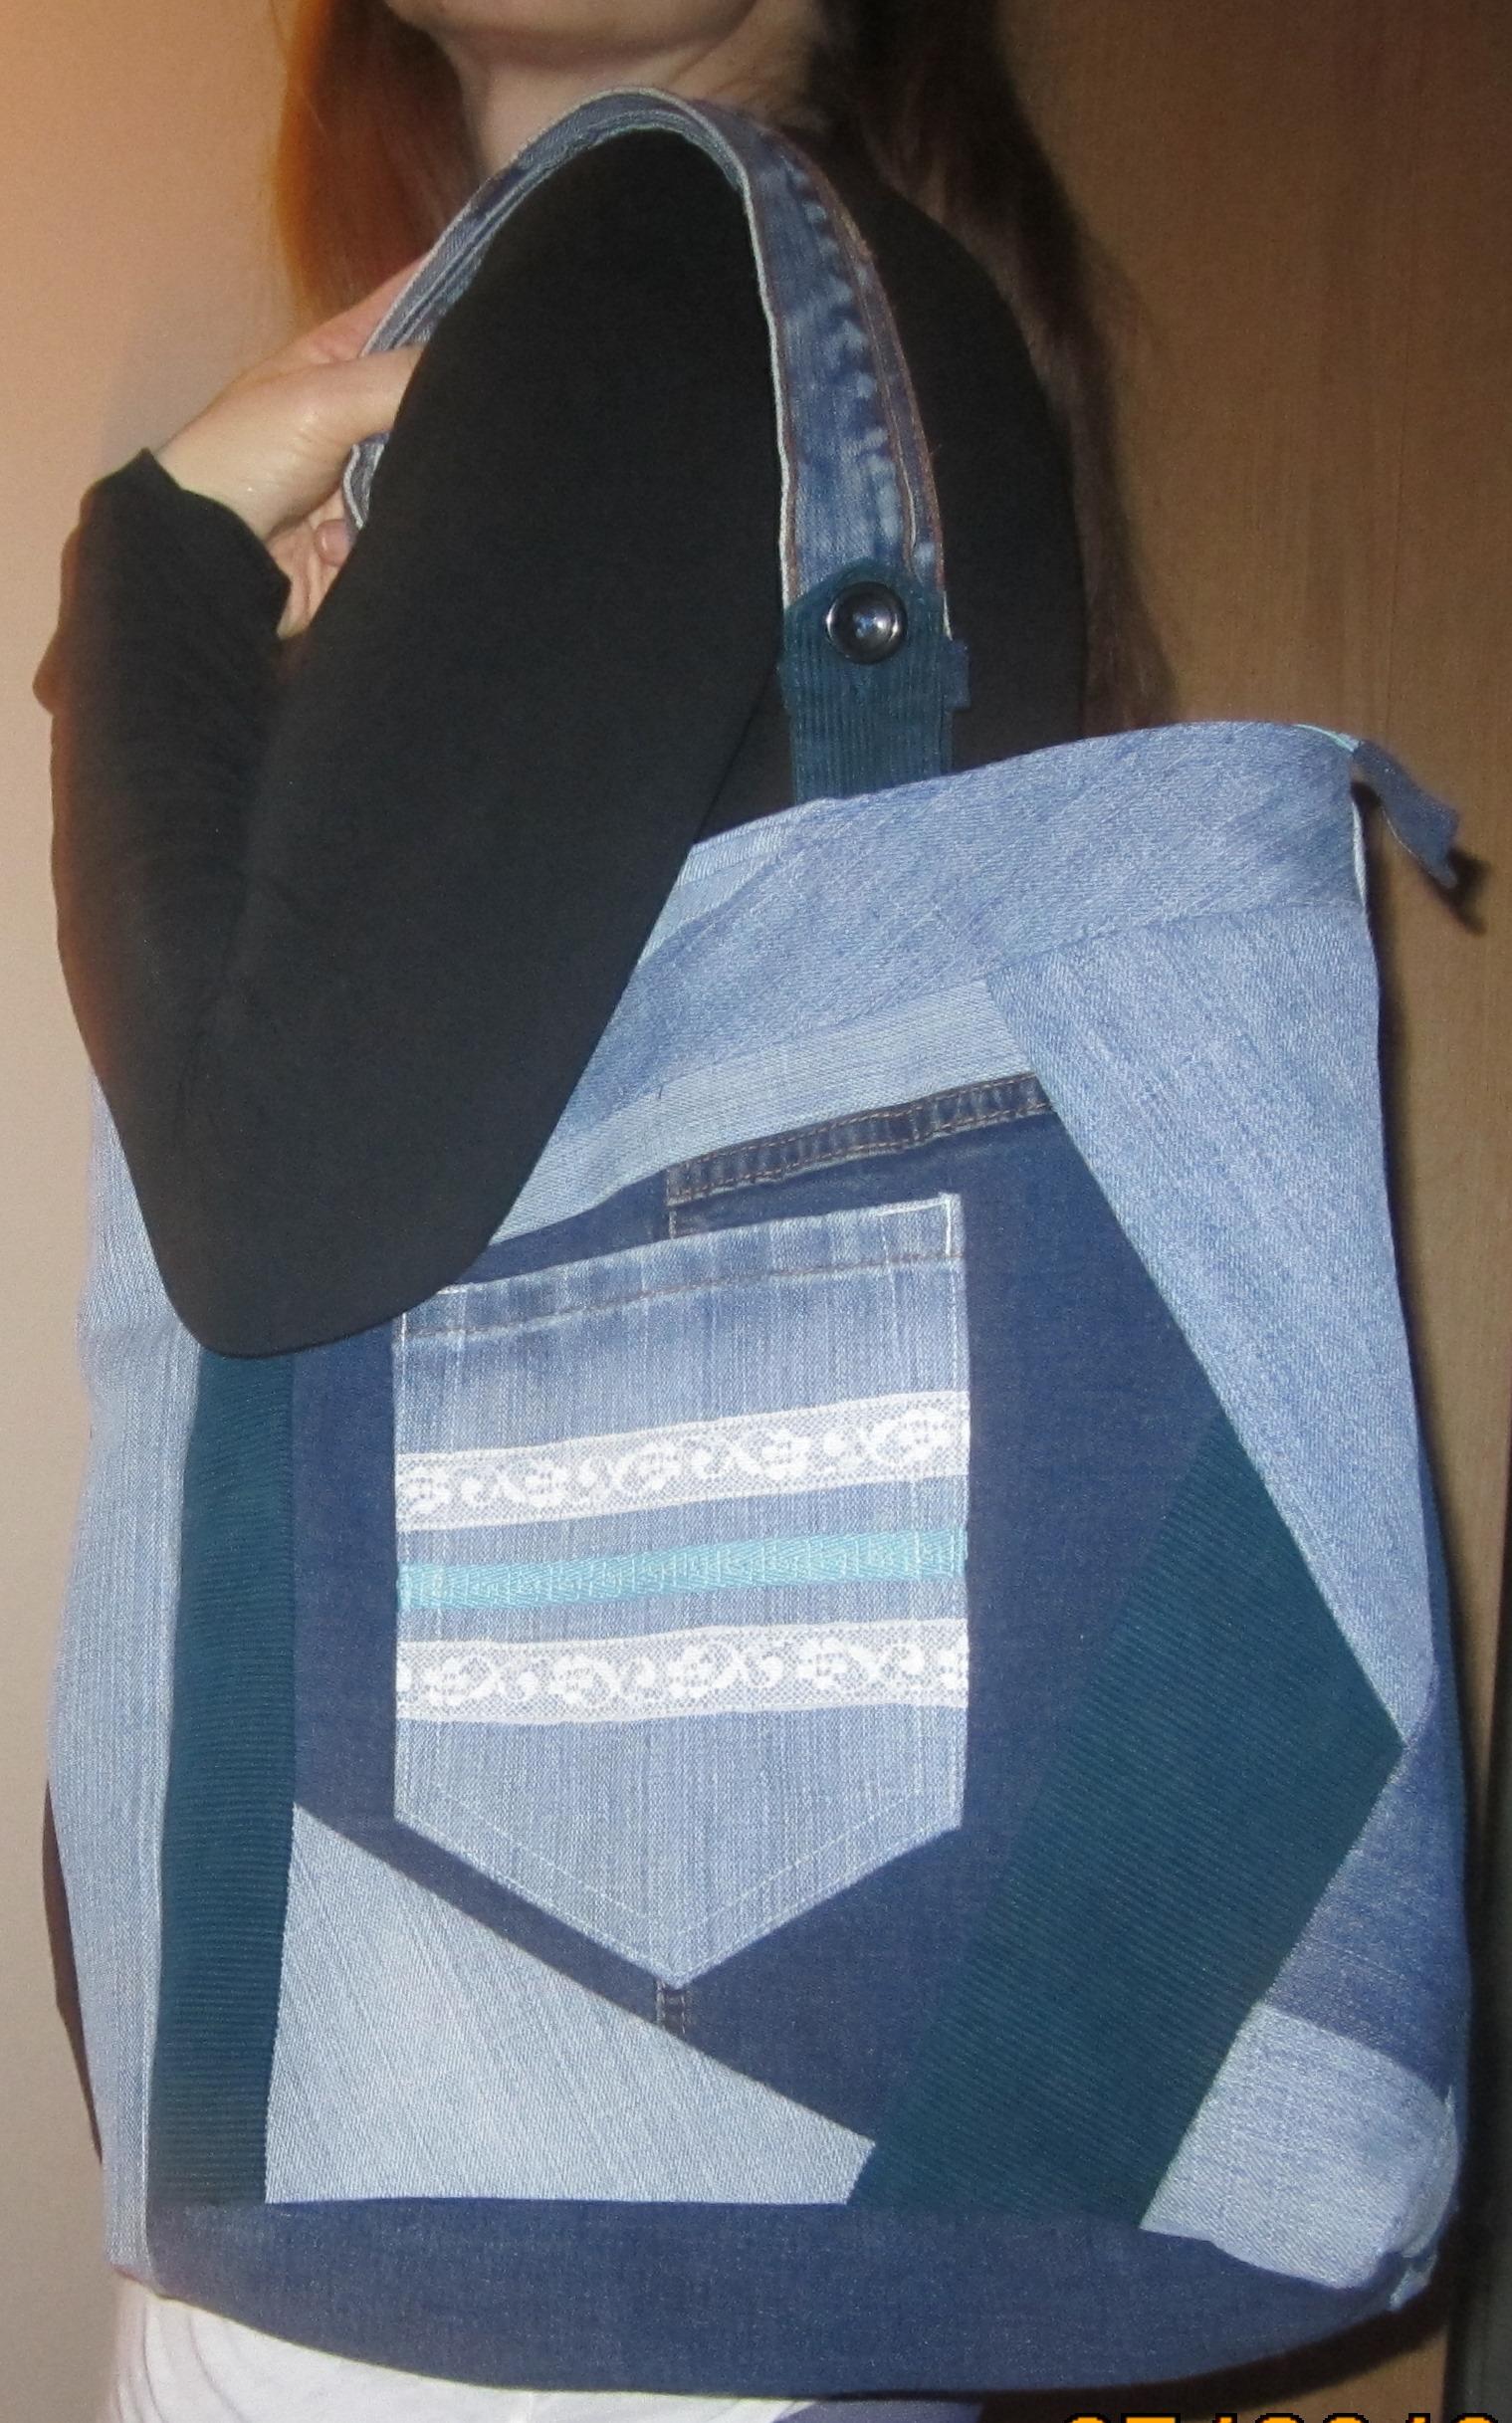 farkkulaukku